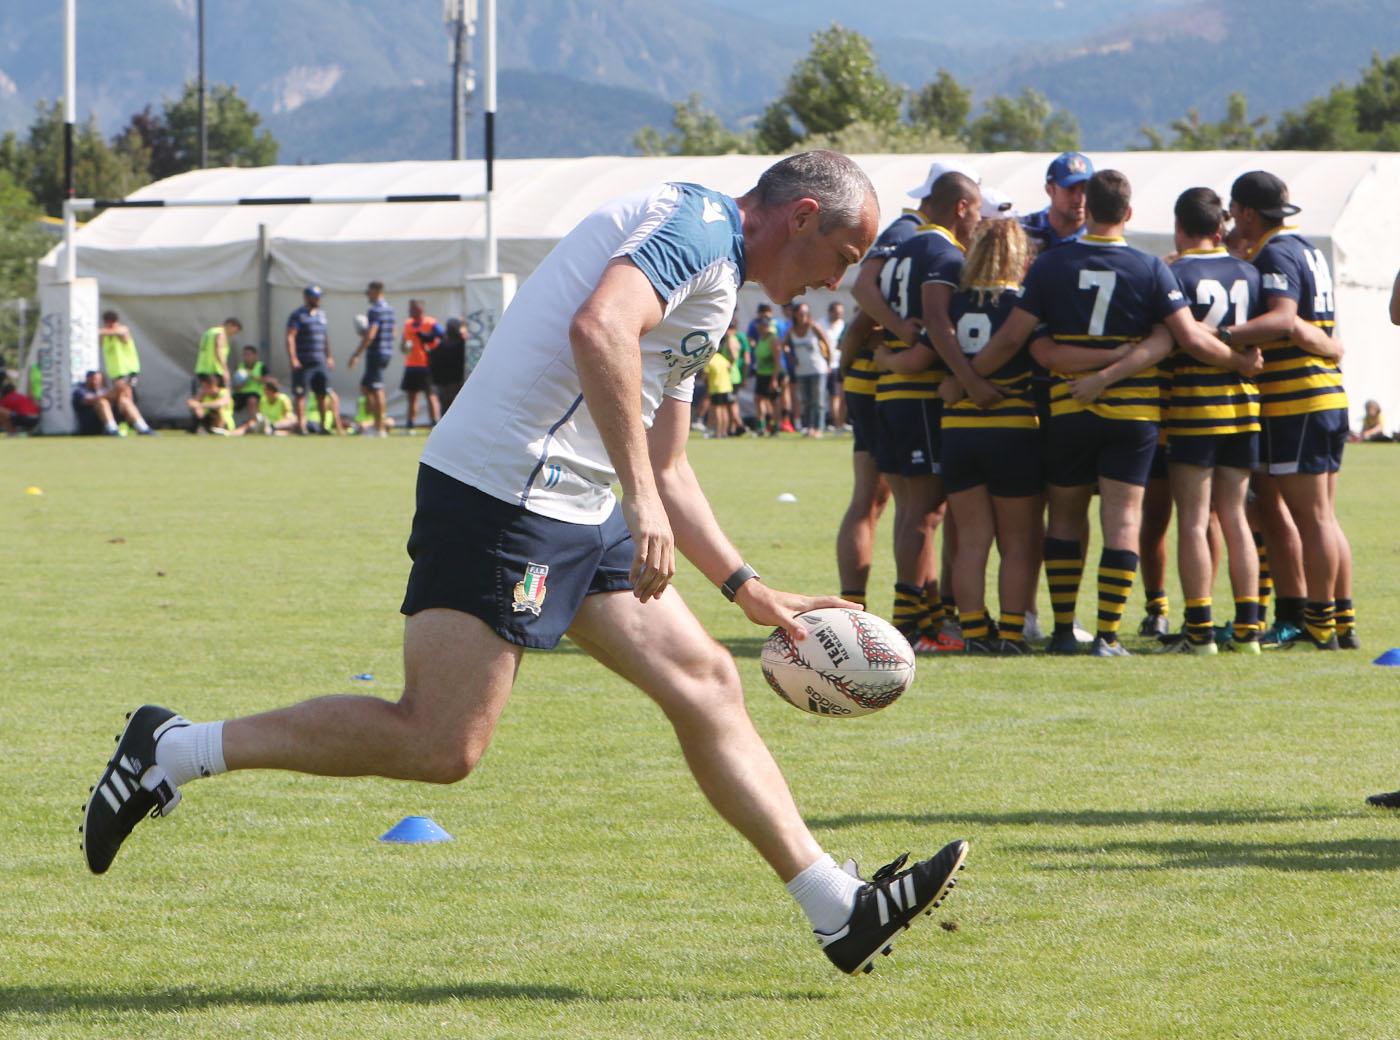 Tocco D'Azzurro Pergine Valsugana Ospita gli Azzurri del Rugby